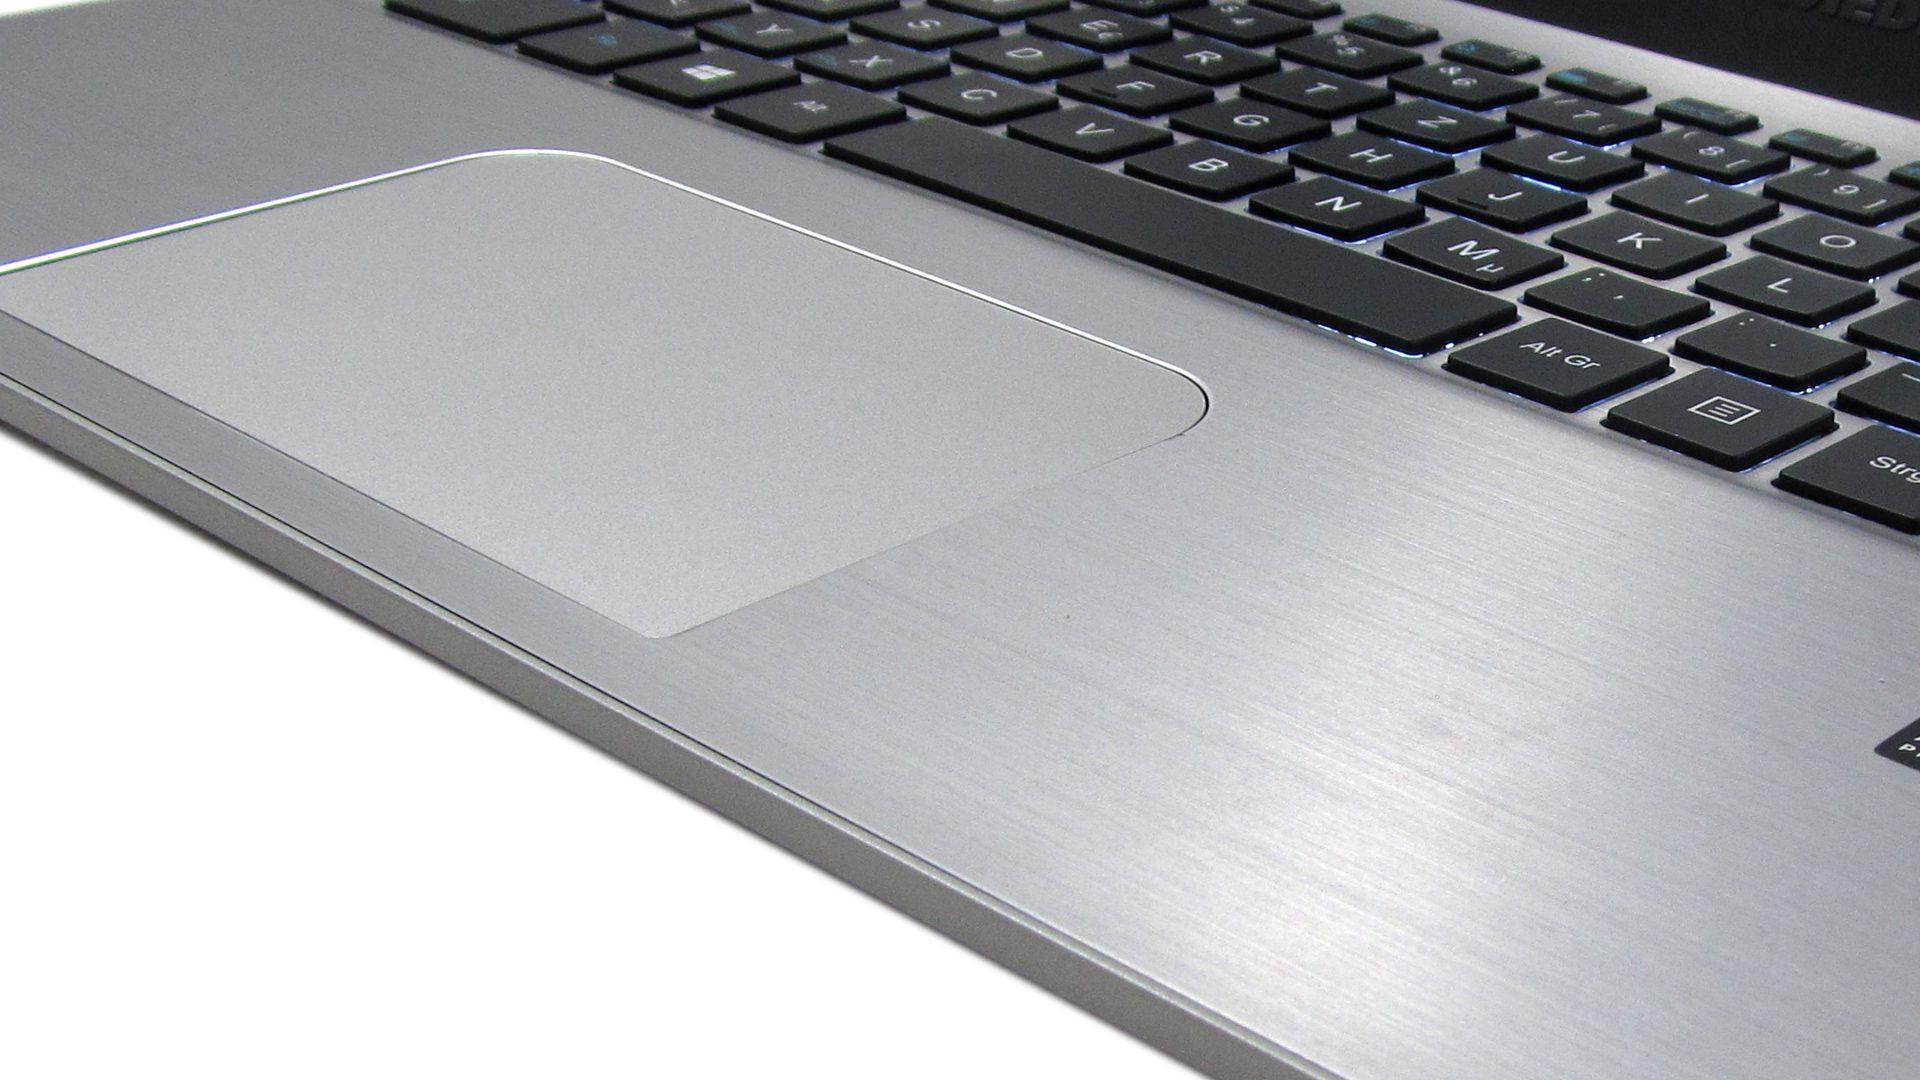 Medion_Akoya_S3409_Tastatur-4